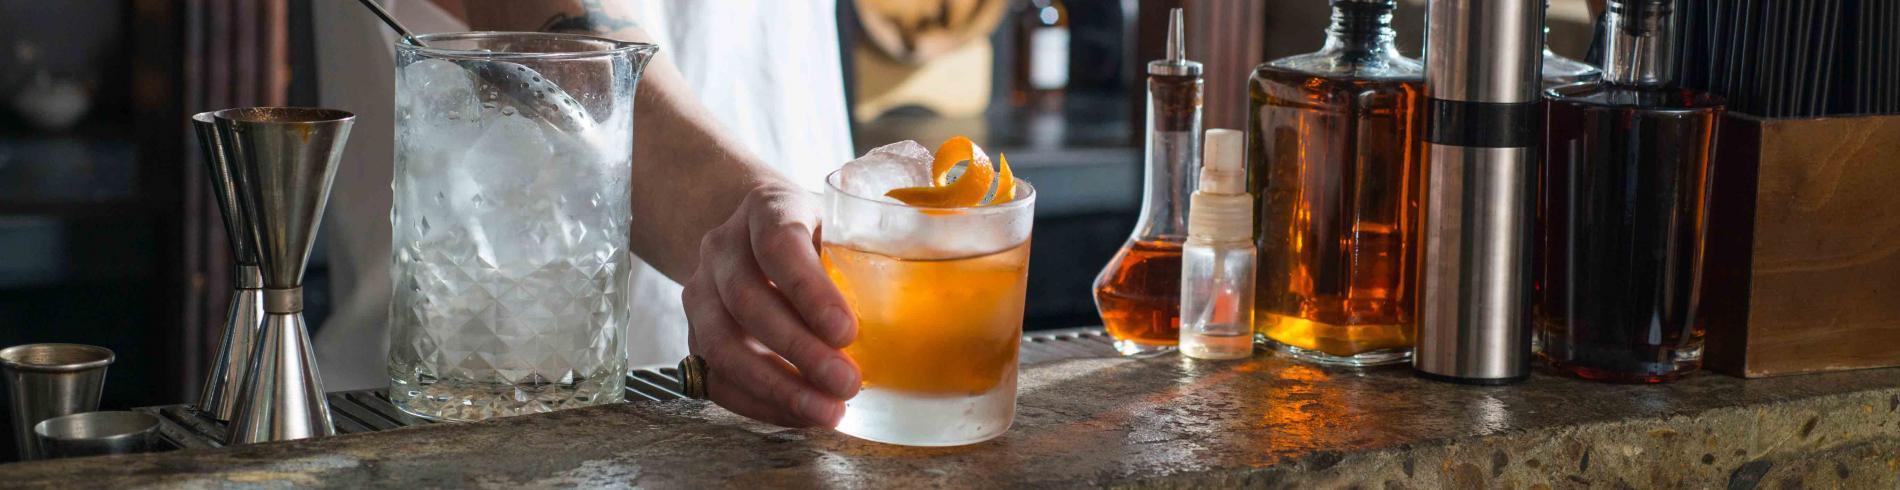 A bartender serves a cocktail at The Vault